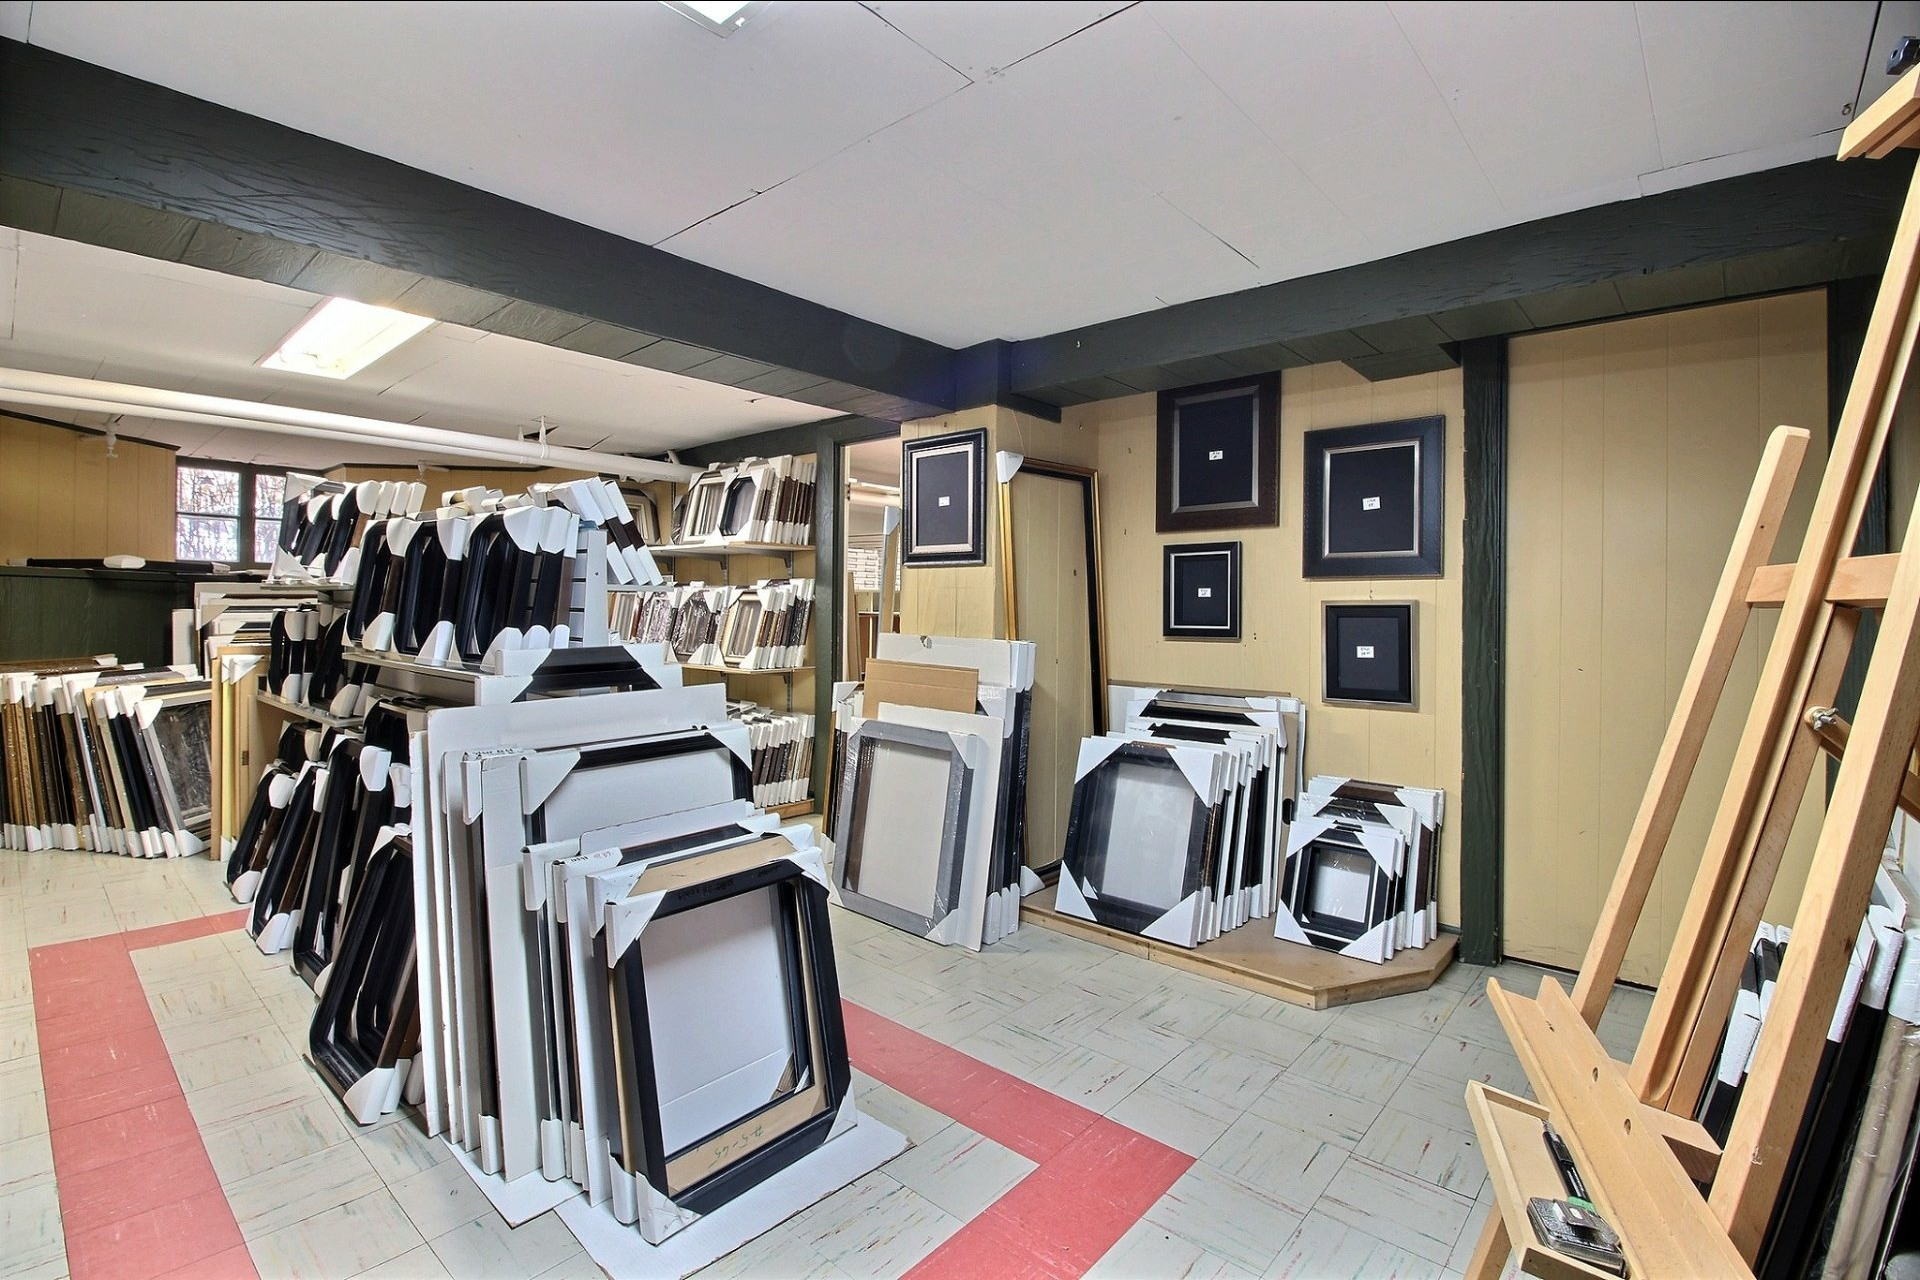 image 27 - Bureau À vendre Joliette